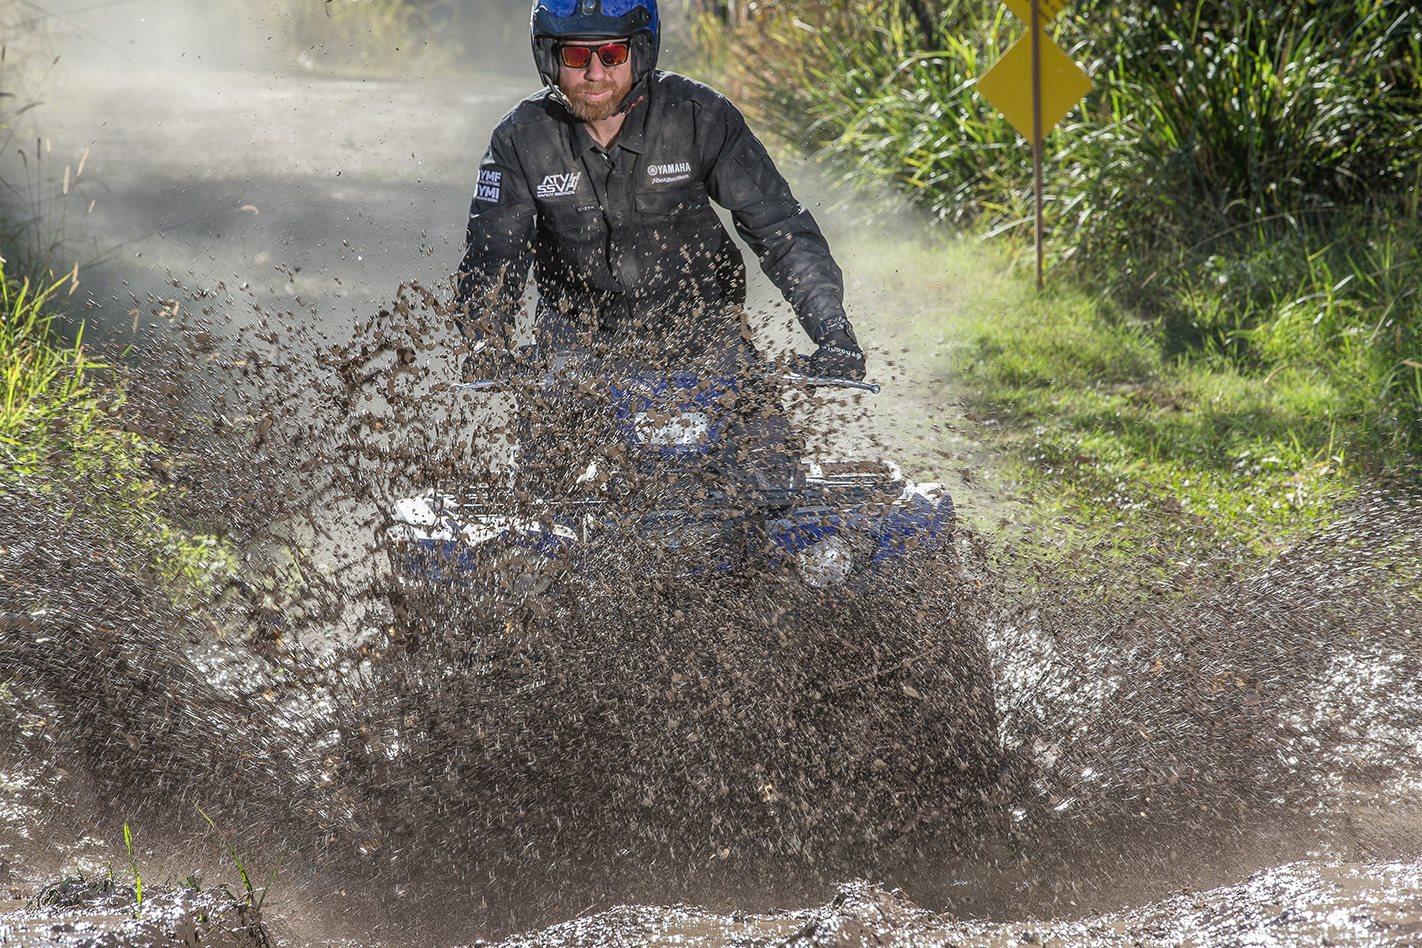 Yamaha Kodiak 450 ATV Quad mud